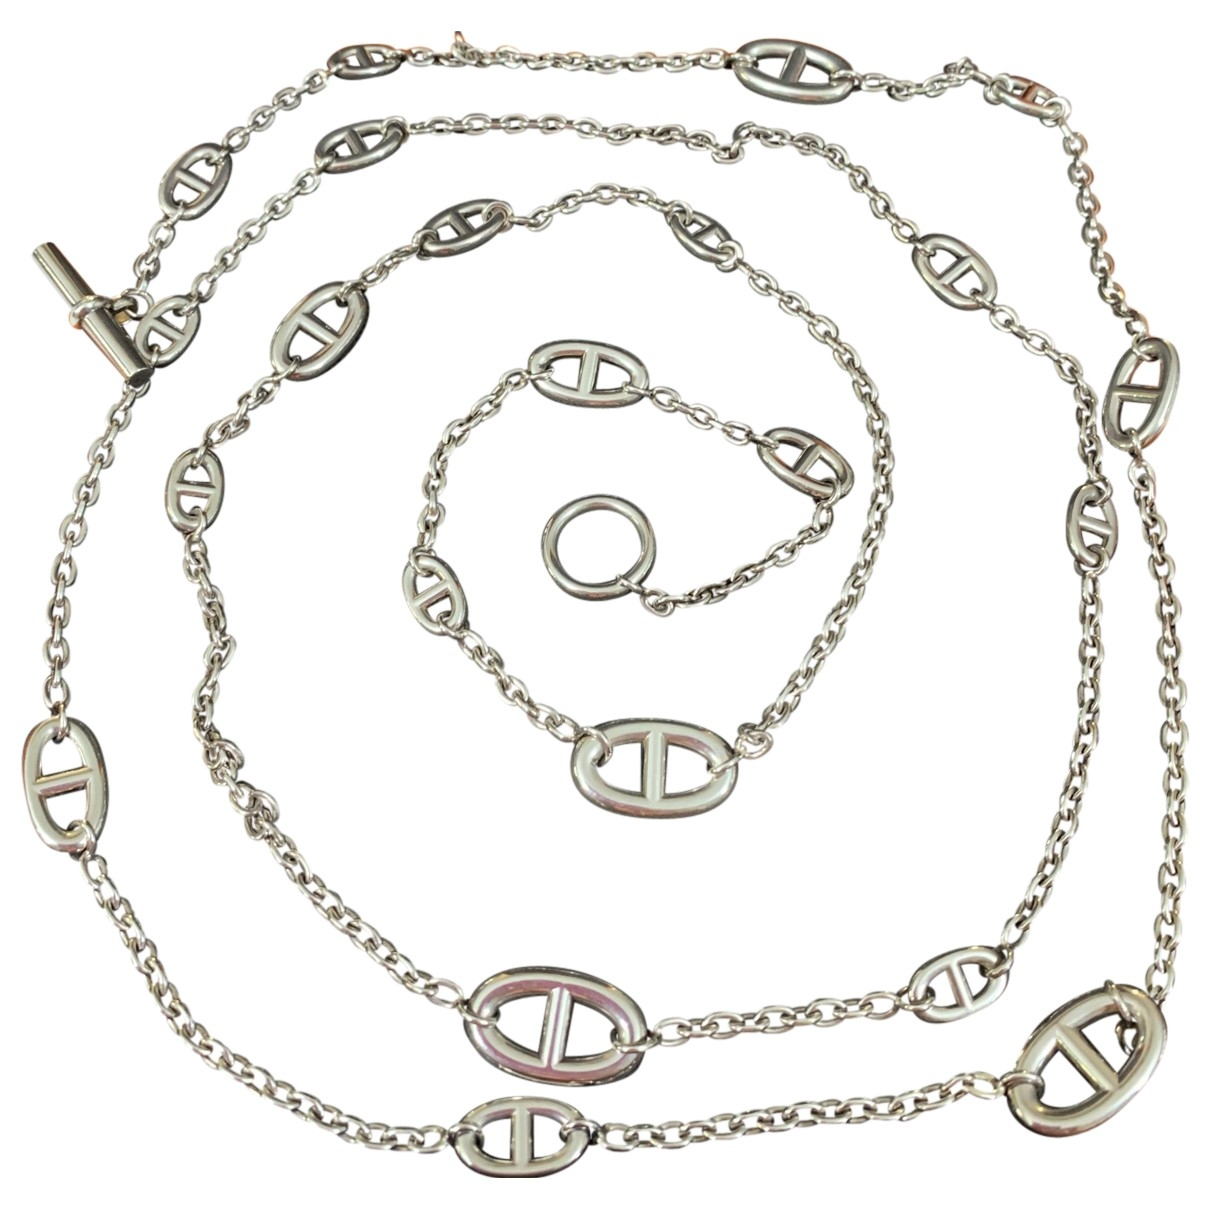 Collar Farandole de Plata Hermes